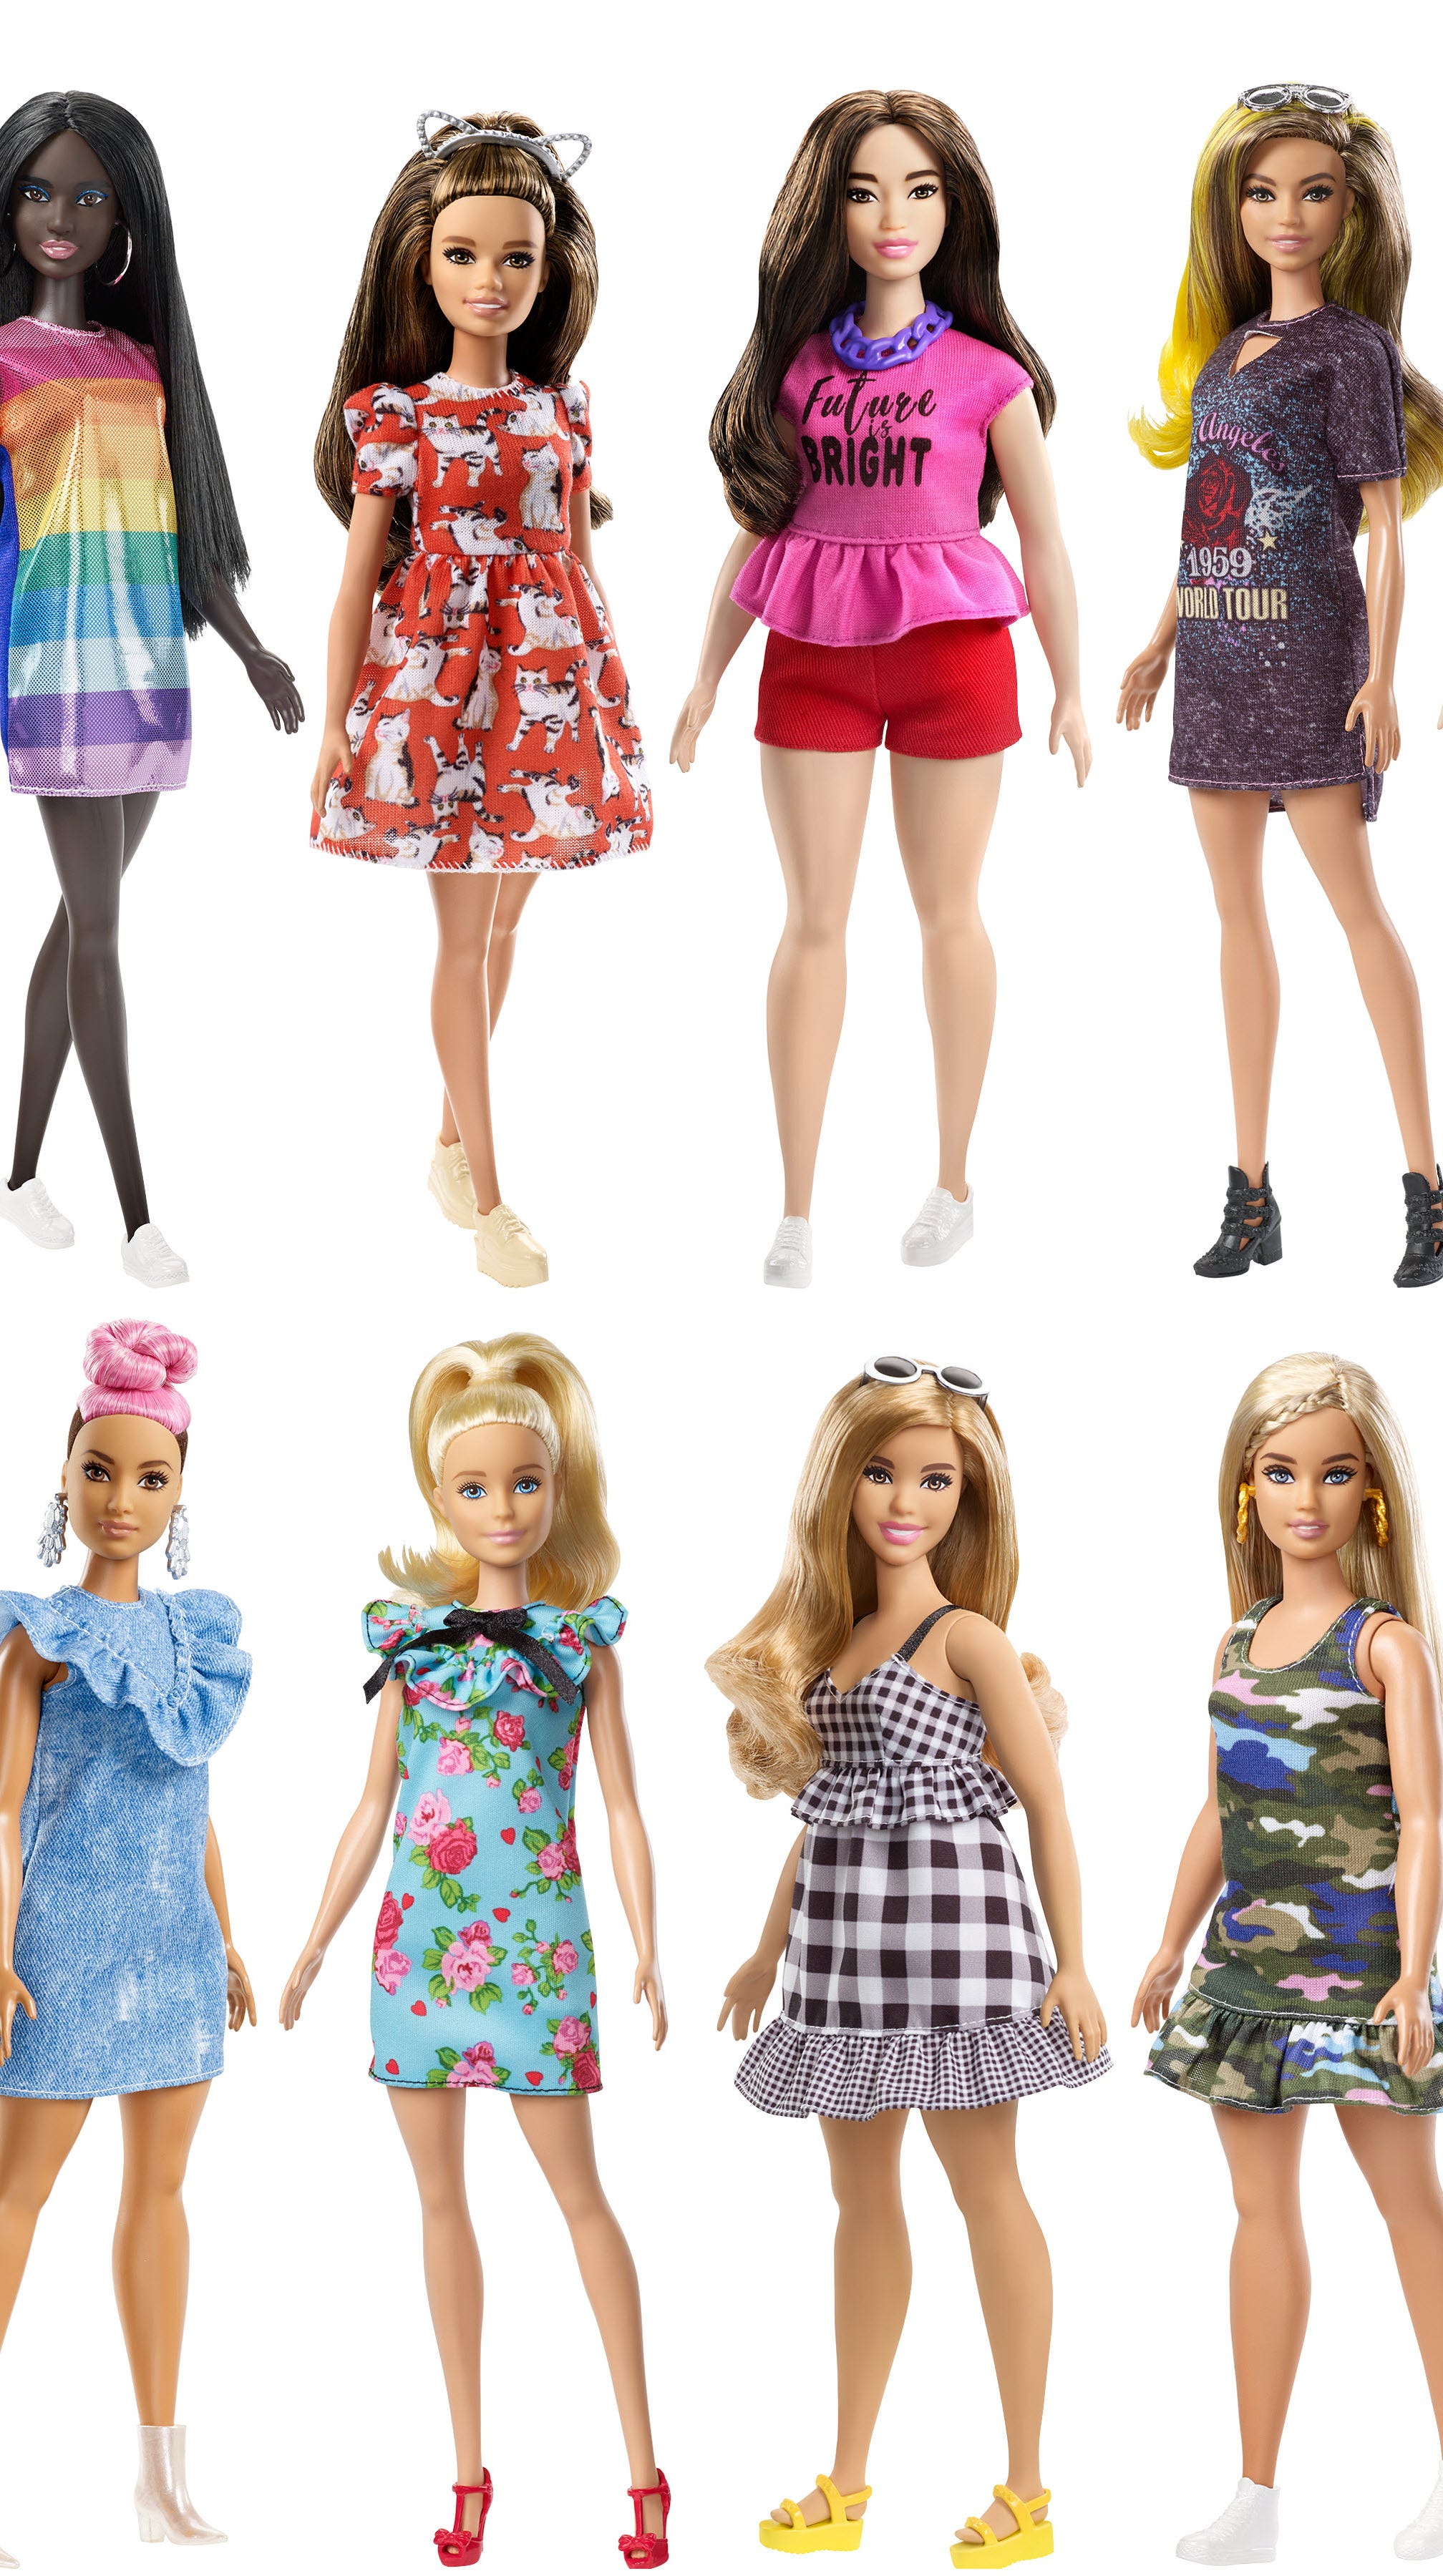 NEW 2016 Barbie Evolution Fashionista Fab Fringe Tall Doll Denim Shorts Clothes